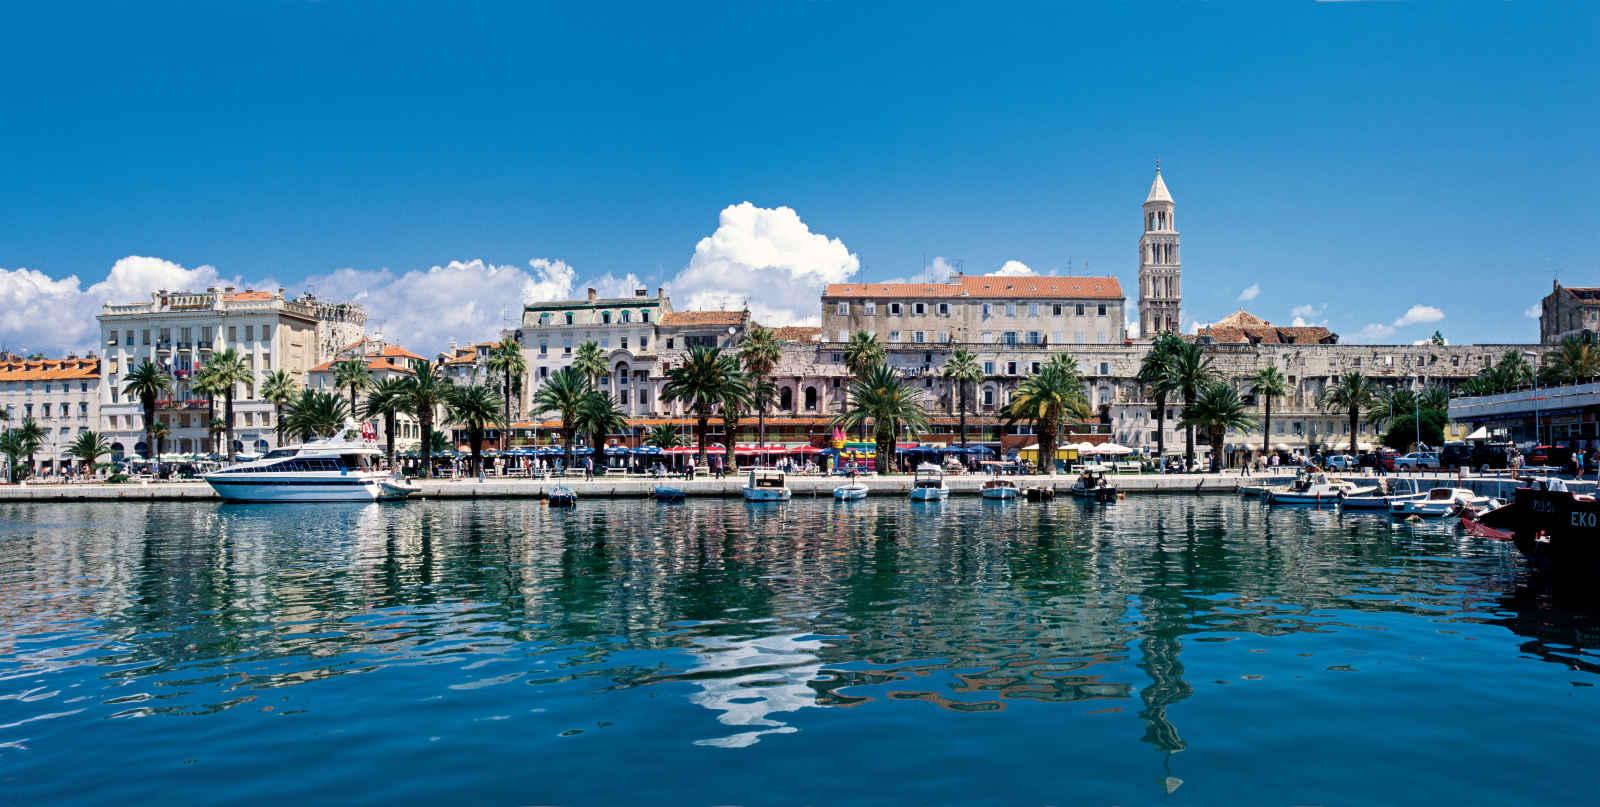 Croatie : Joyaux de Dalmatie